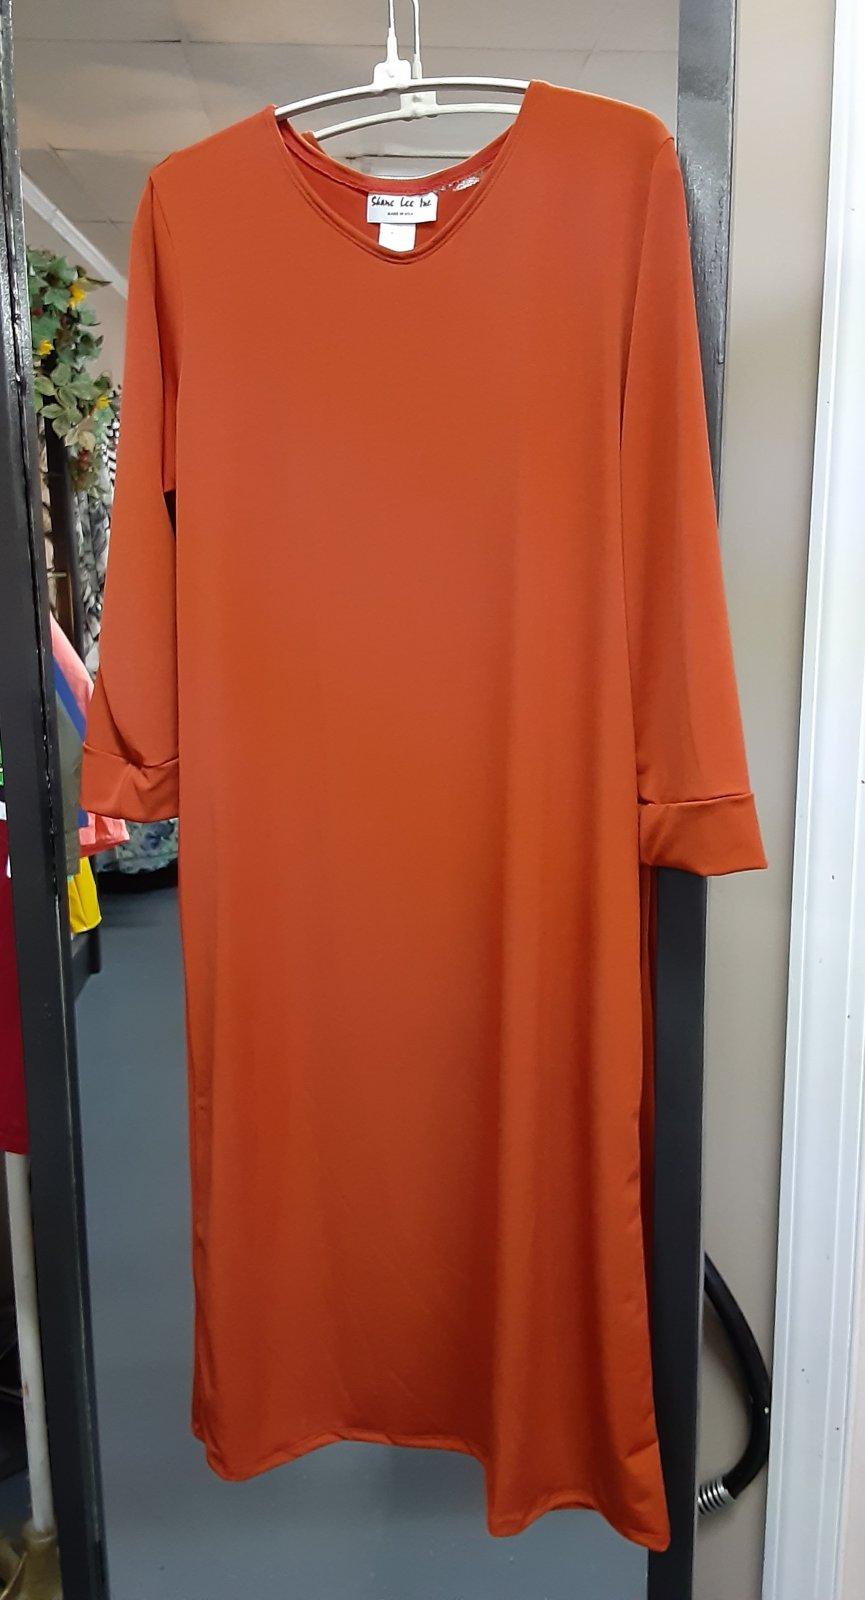 Shane Lee Rust Layering Dress